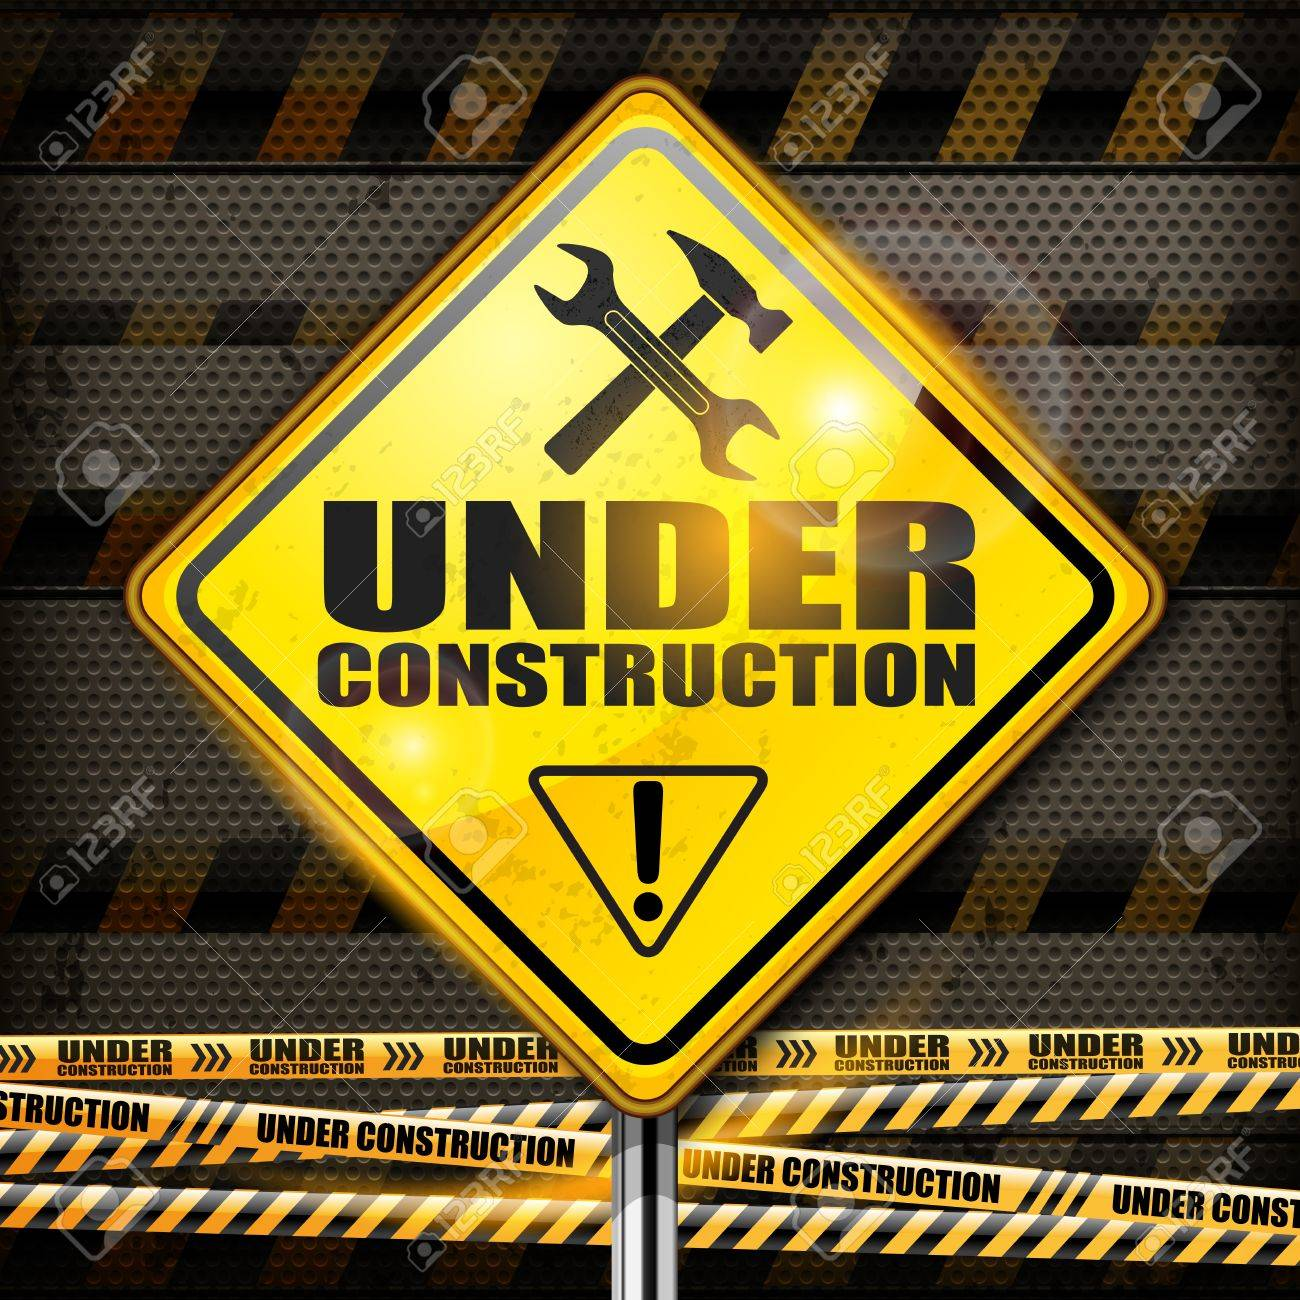 Under construction sign yellow rhombus on black background,  illustration Stock Vector - 19840939